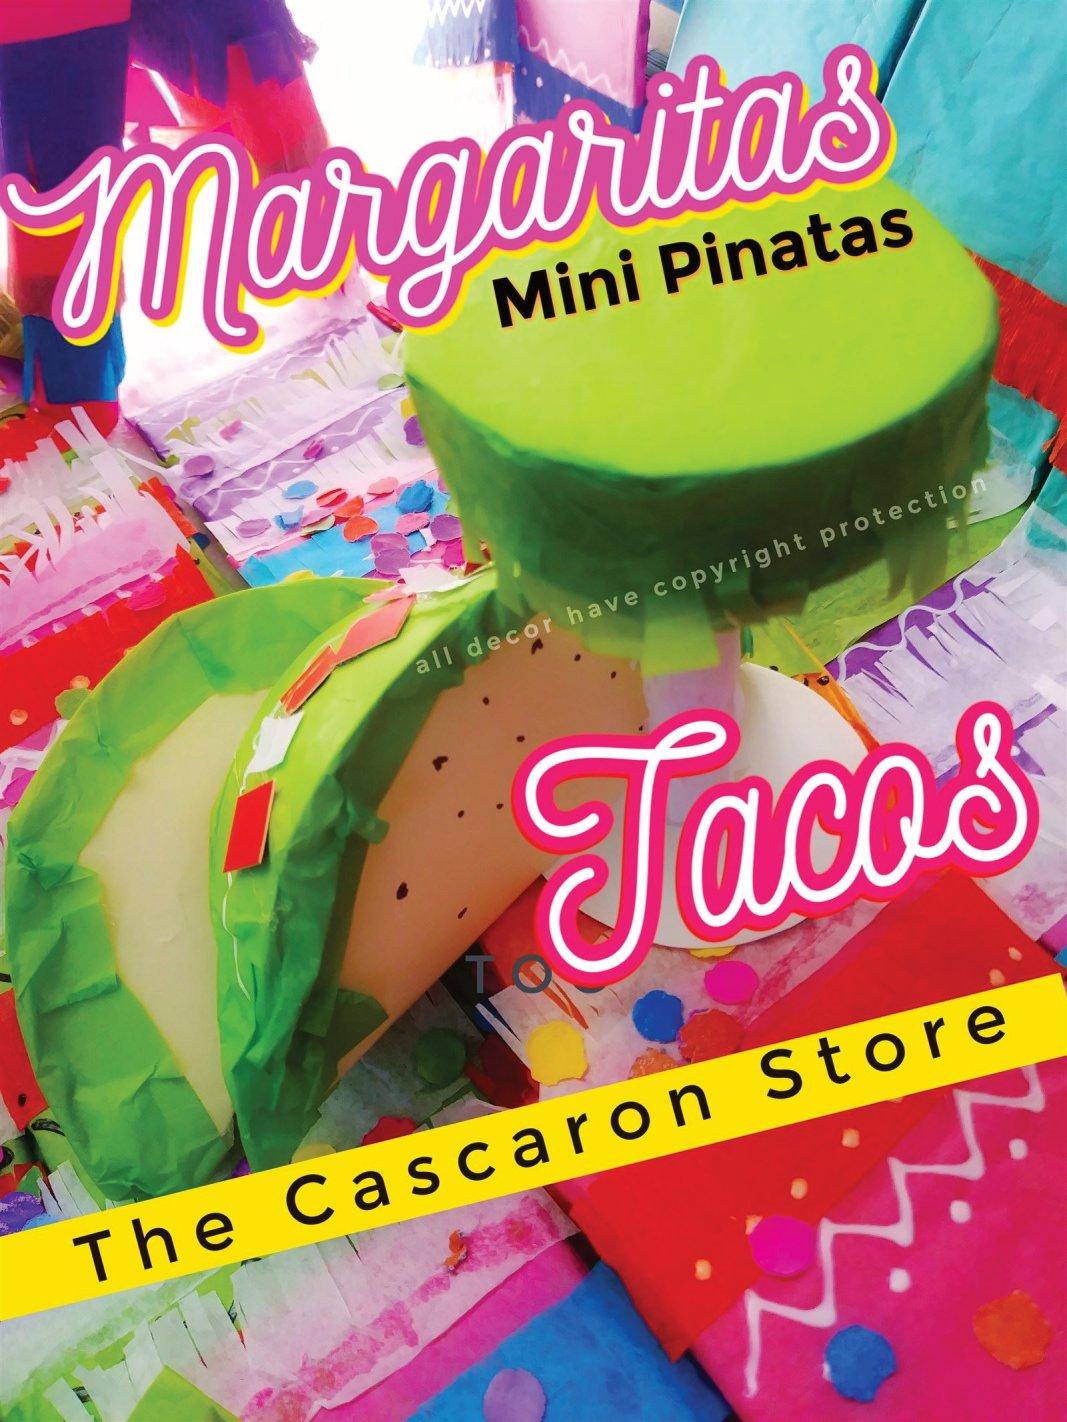 Fiesta Decorations Tacos & Margaritas Mini Pinatas